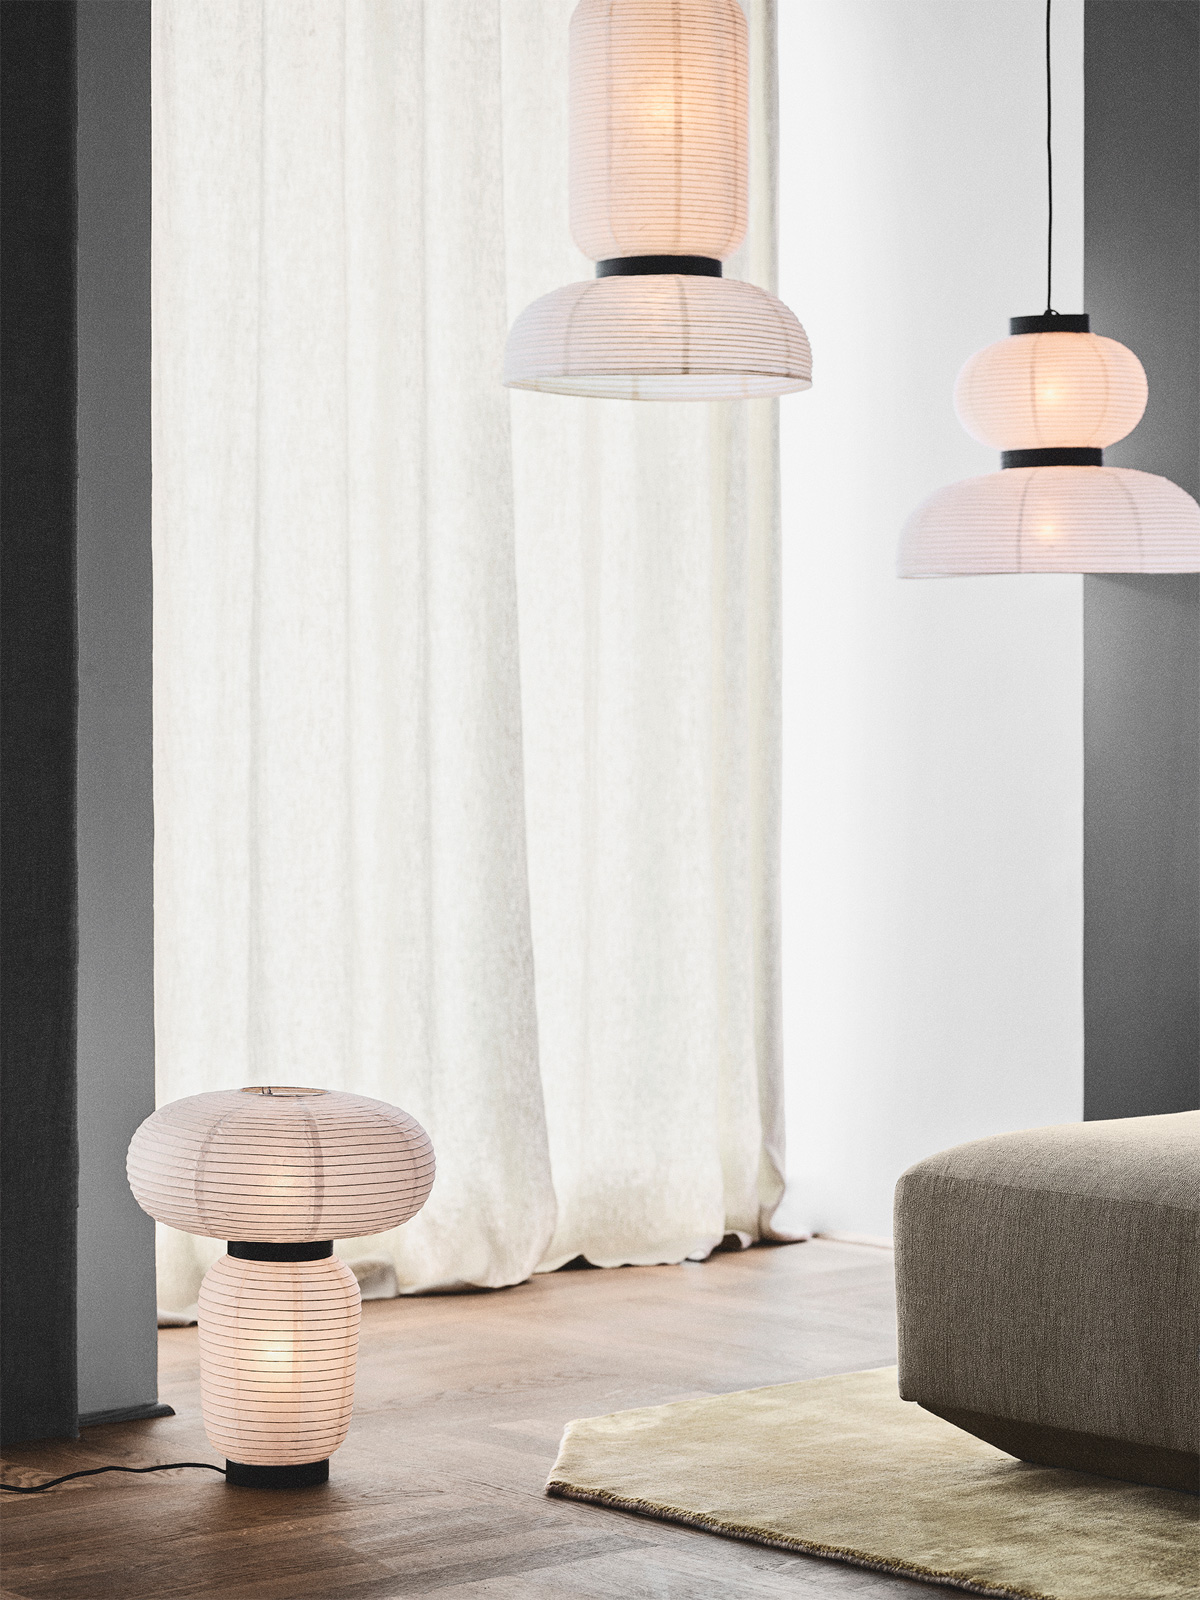 &tradition Formakami Papierlampen Design aus Papier DesignORt Onlineshop Berlin